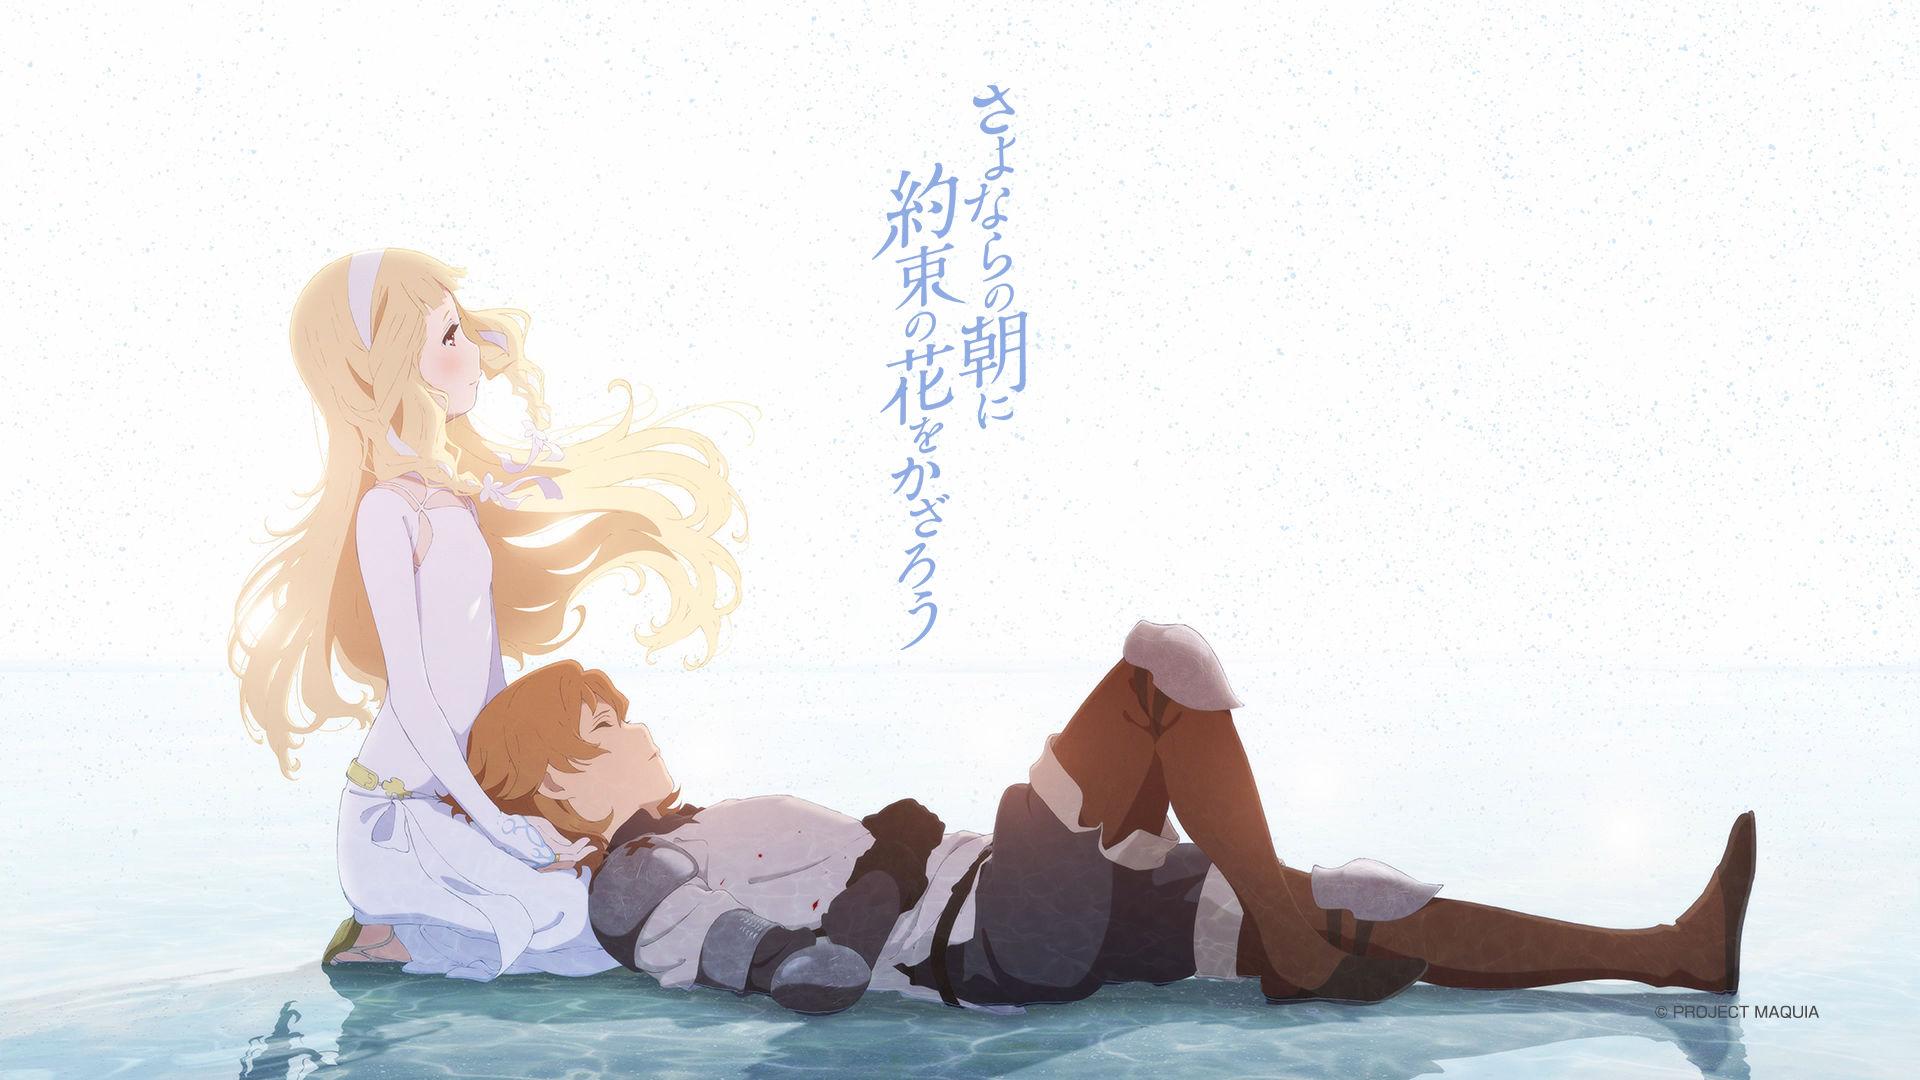 https://subbers.org/poster/Sayoasa.jpg